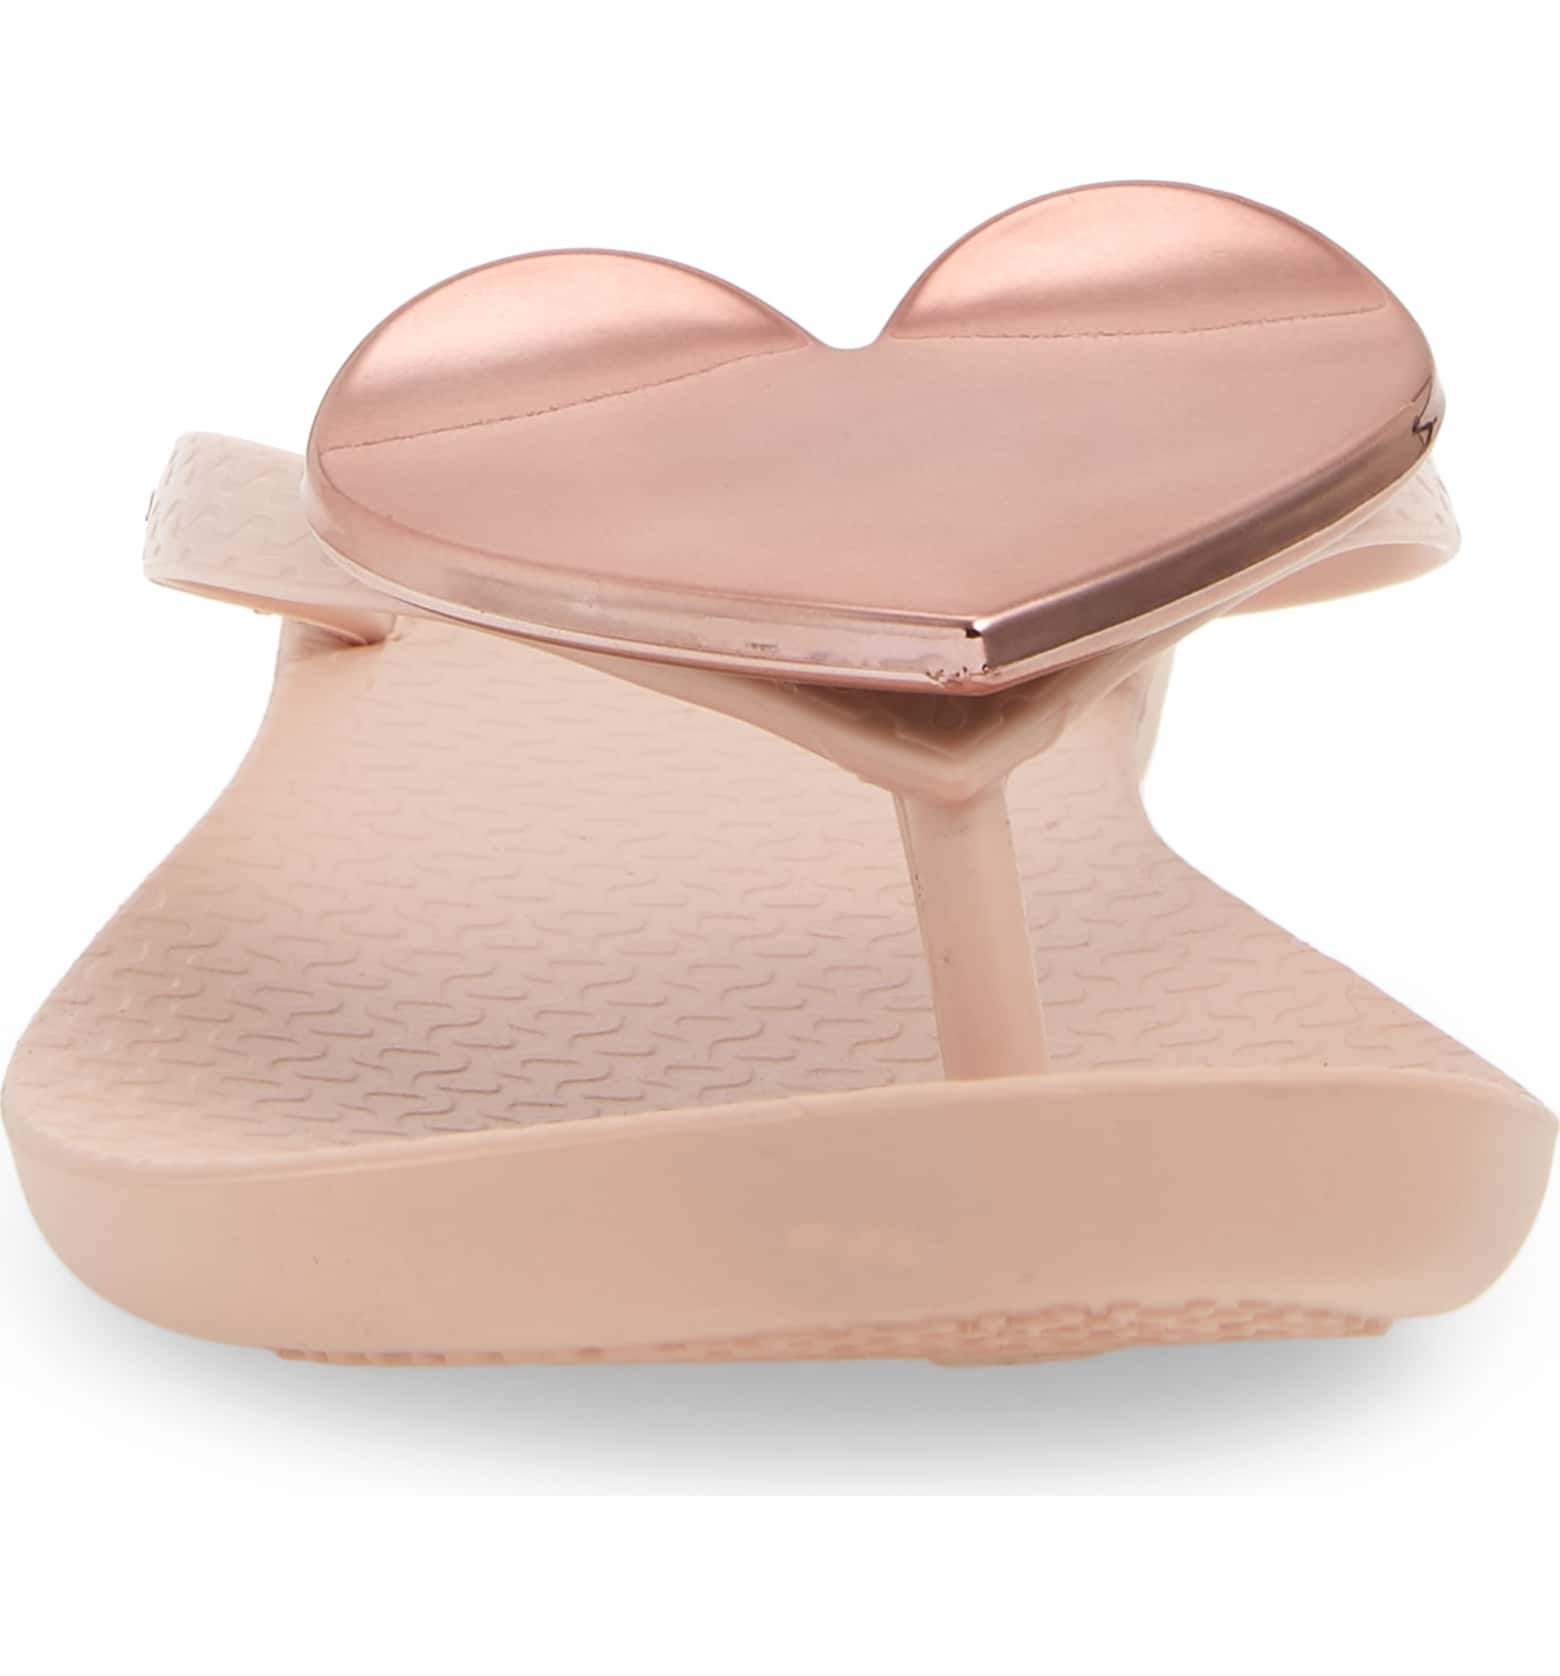 Heart Flip Flops